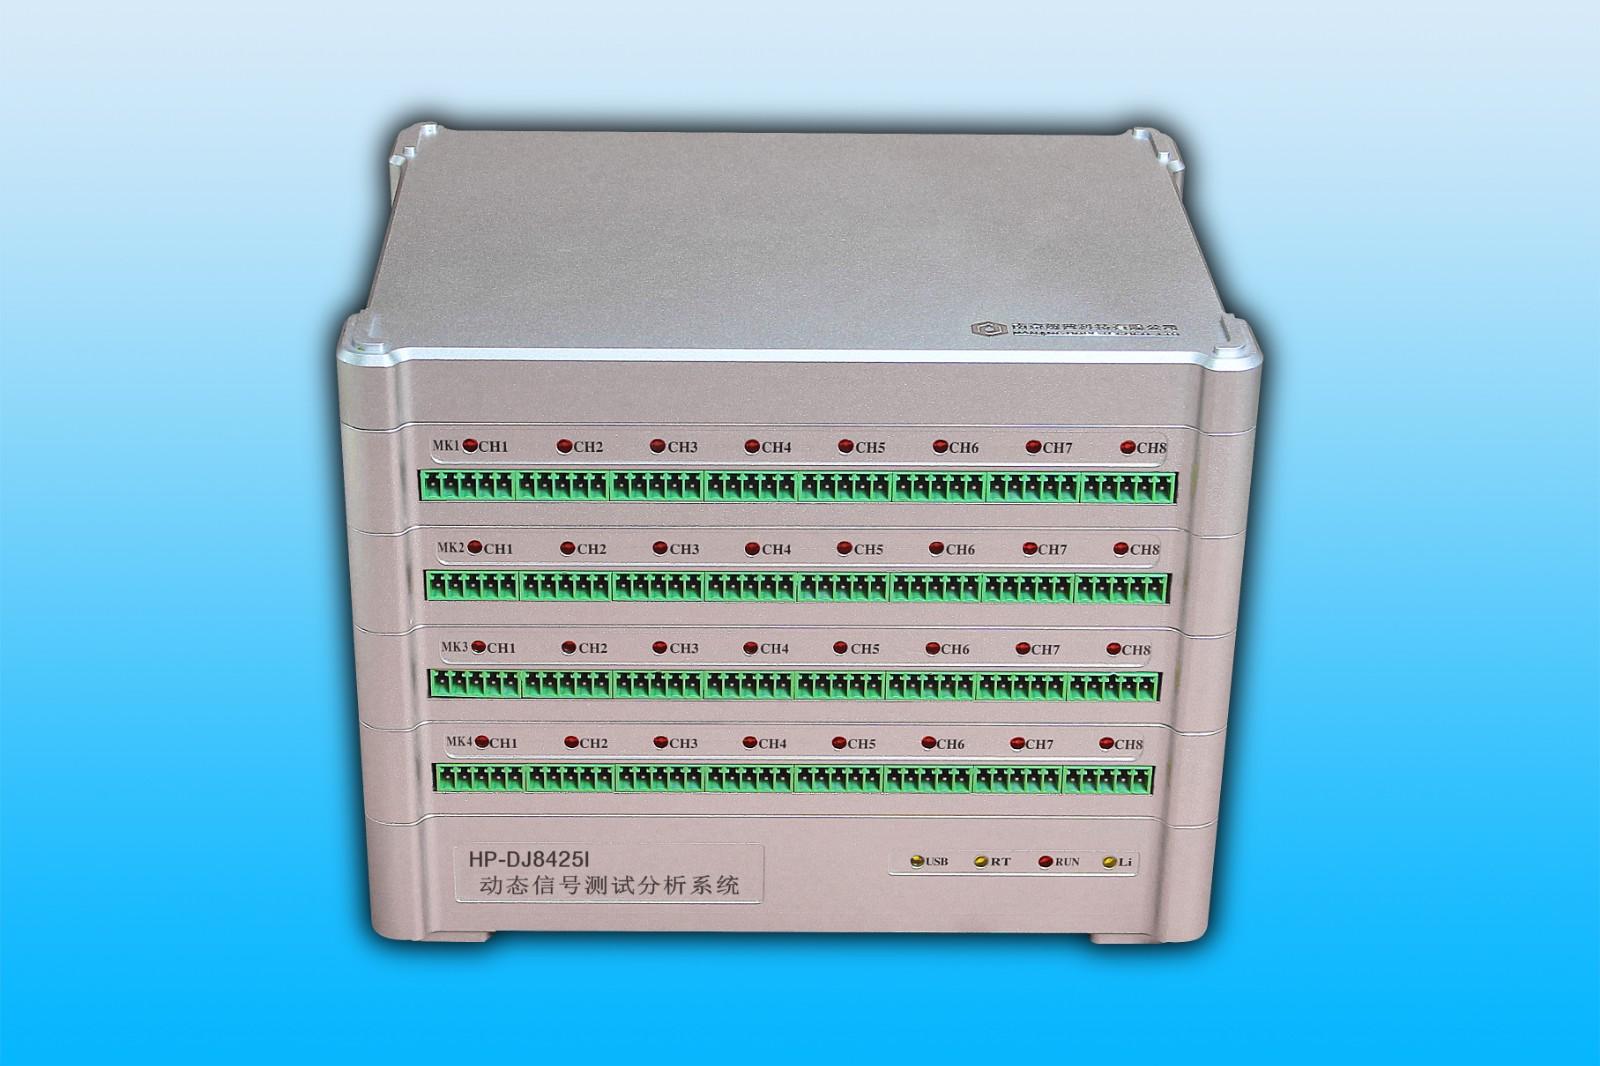 HP-DJ8425I 动态信号测试分析系统